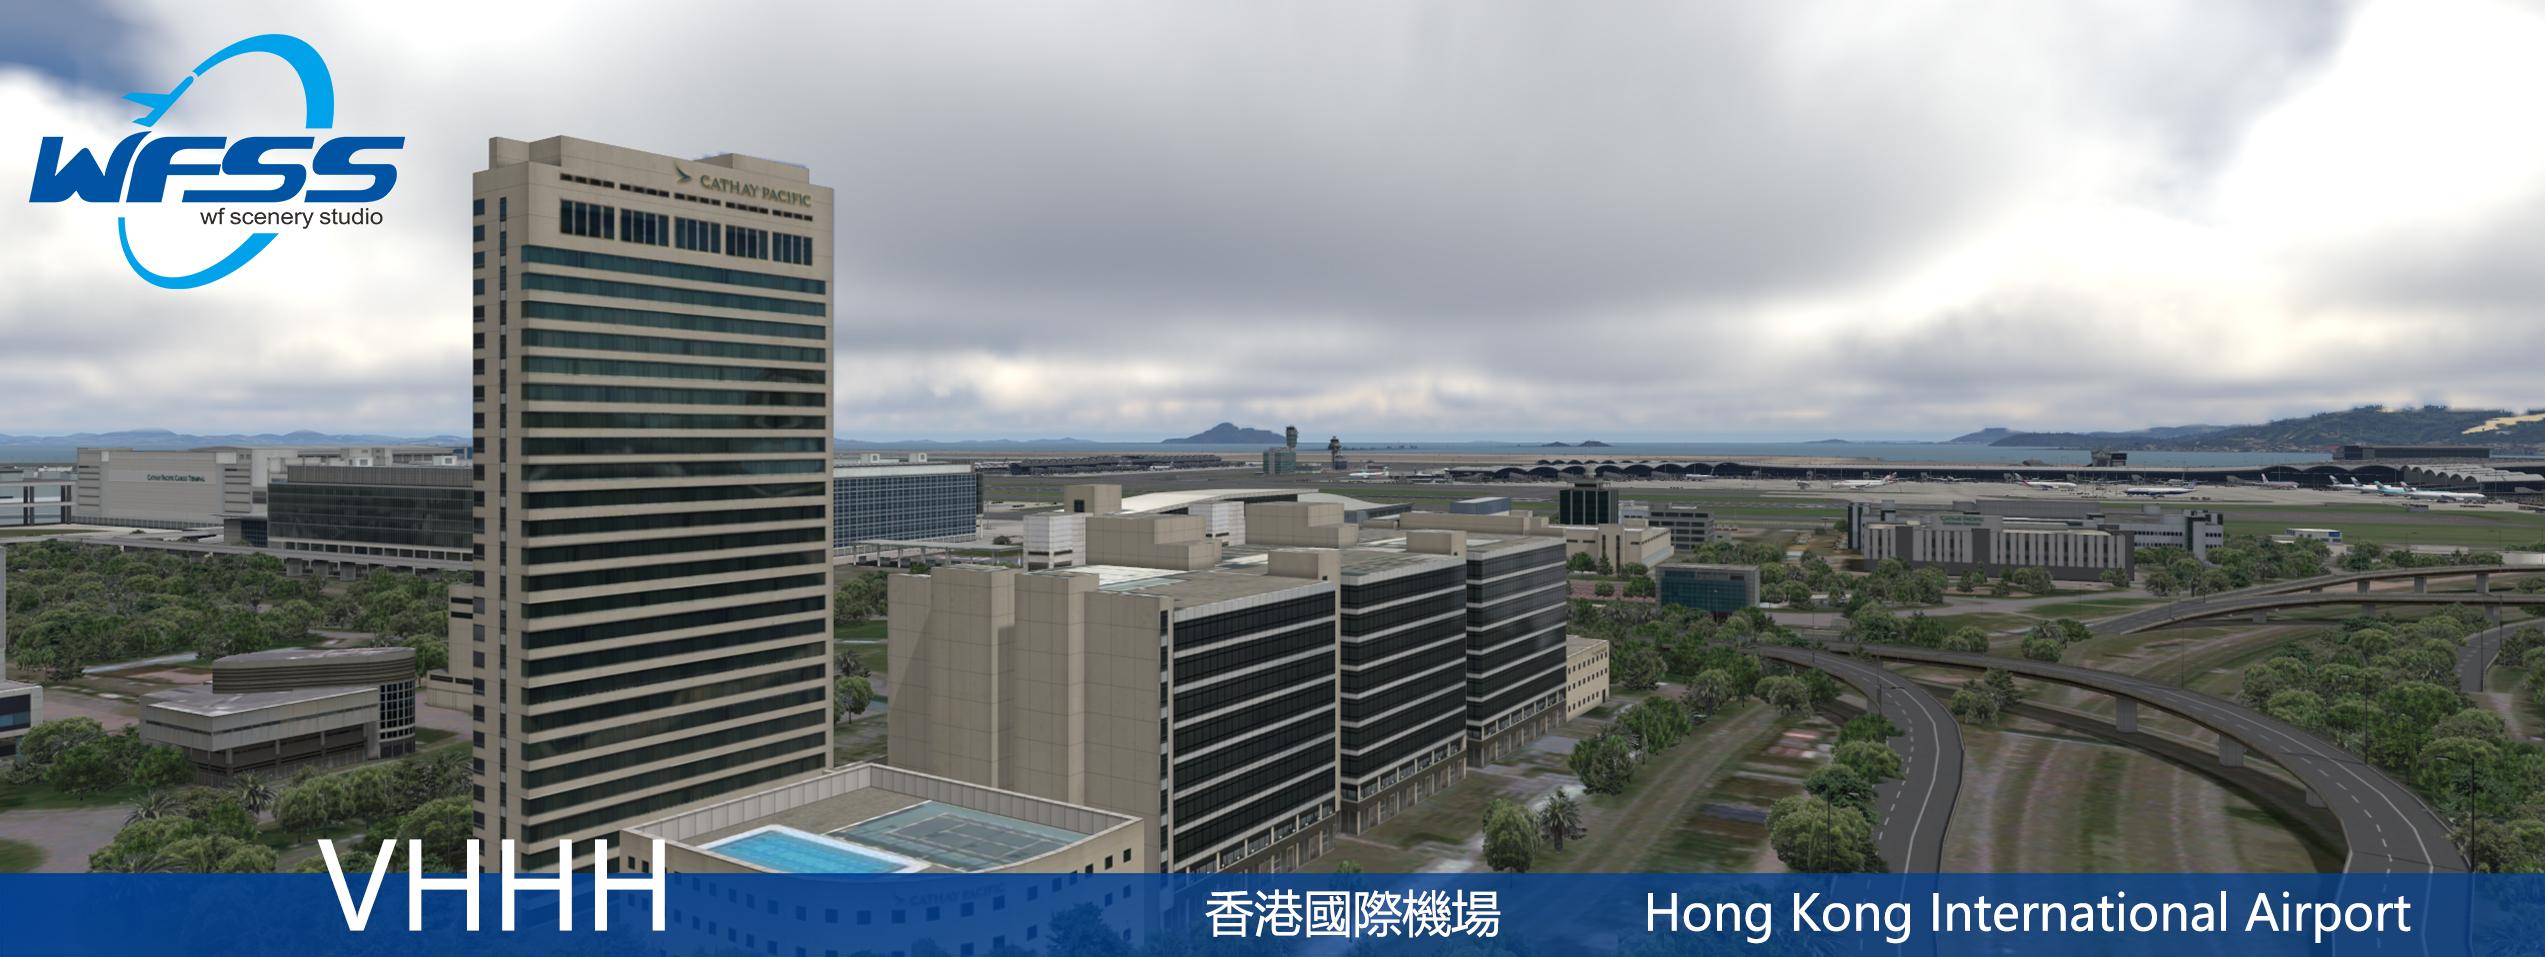 WF SCENERY STUDIO - HONG KONG INTERNATIONAL AIRPORT VHHH P3D